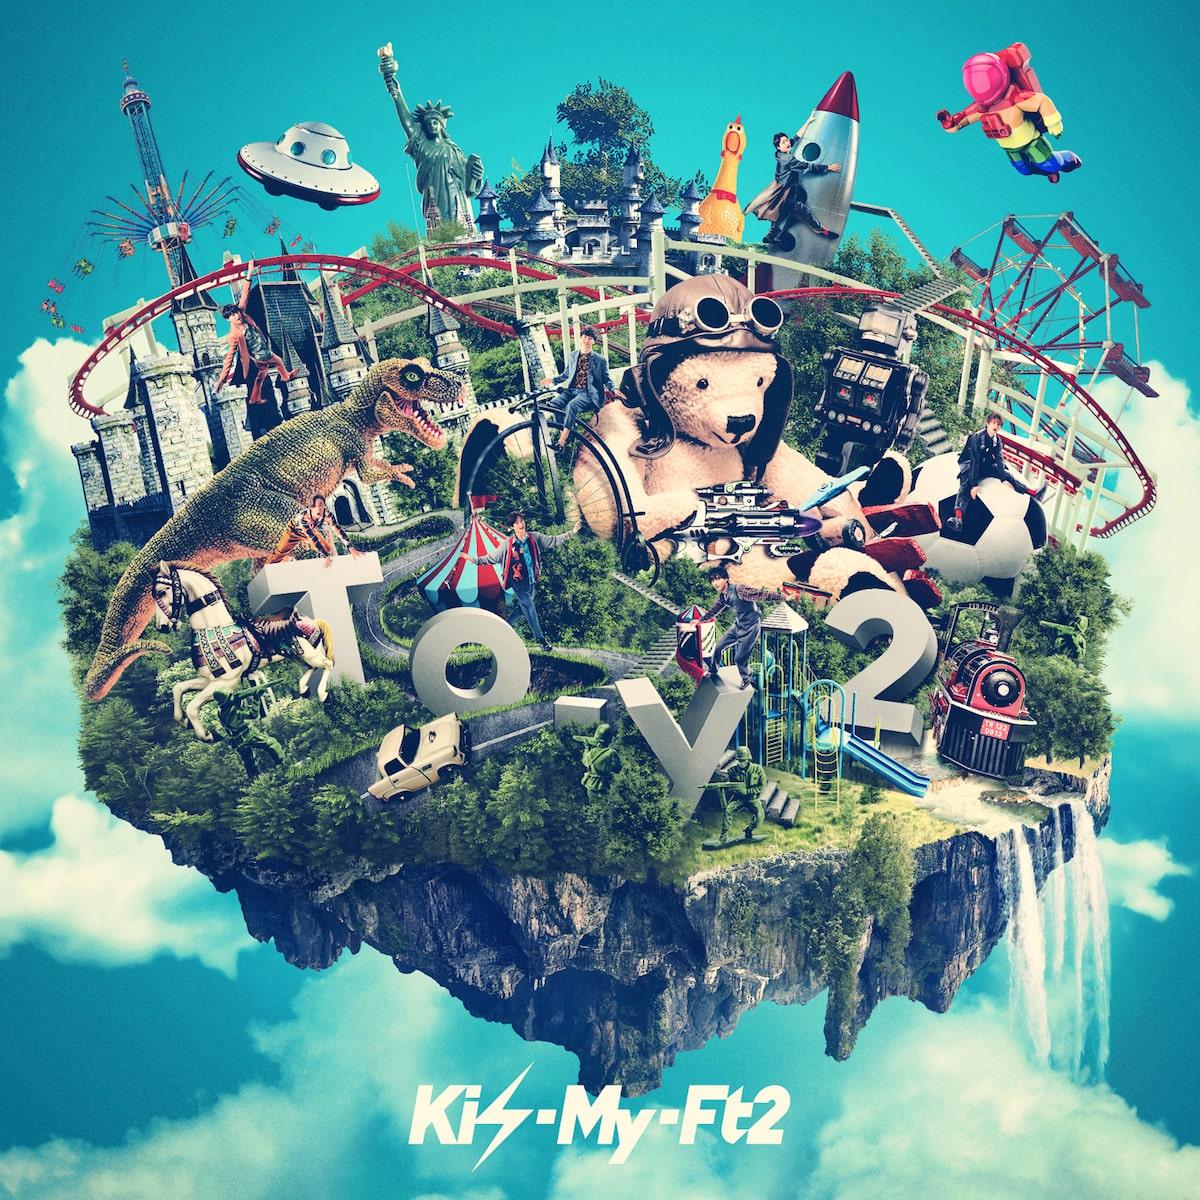 『Kis-My-Ft2 - Cannonball 歌詞』収録の『To-y2』ジャケット